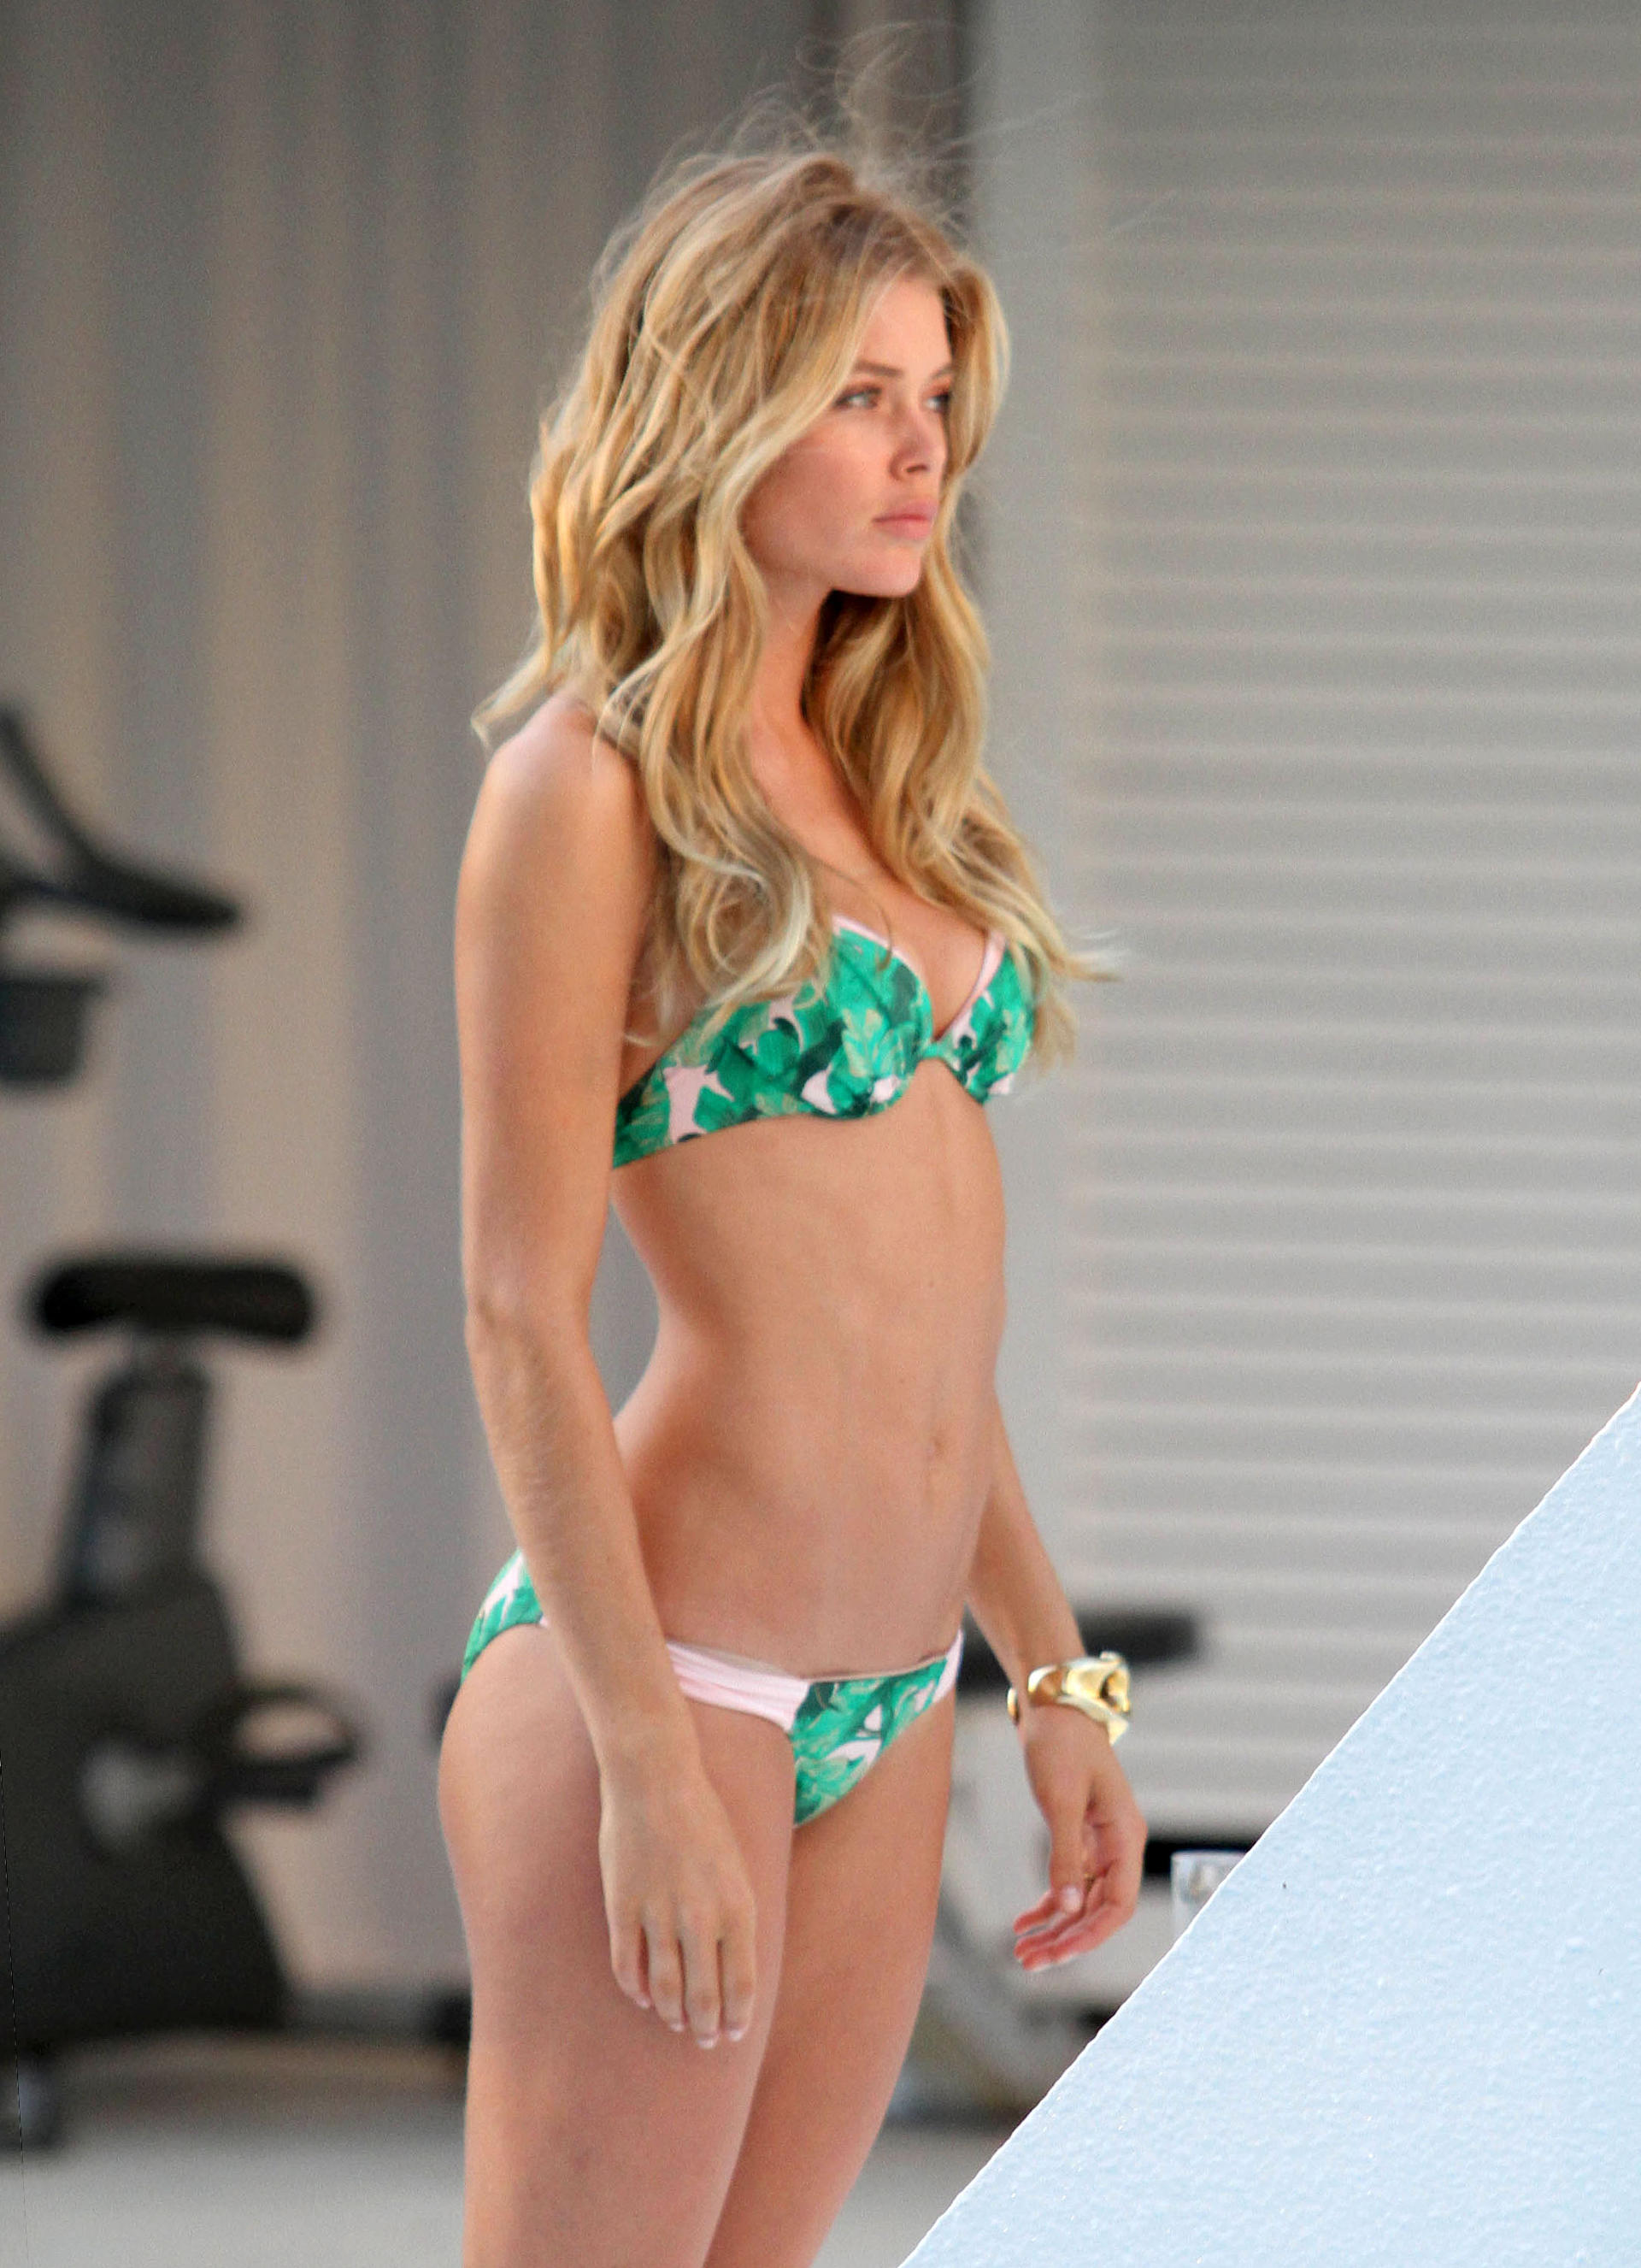 Doutzen Kroes Bikini Bodies Pic 6 of 35